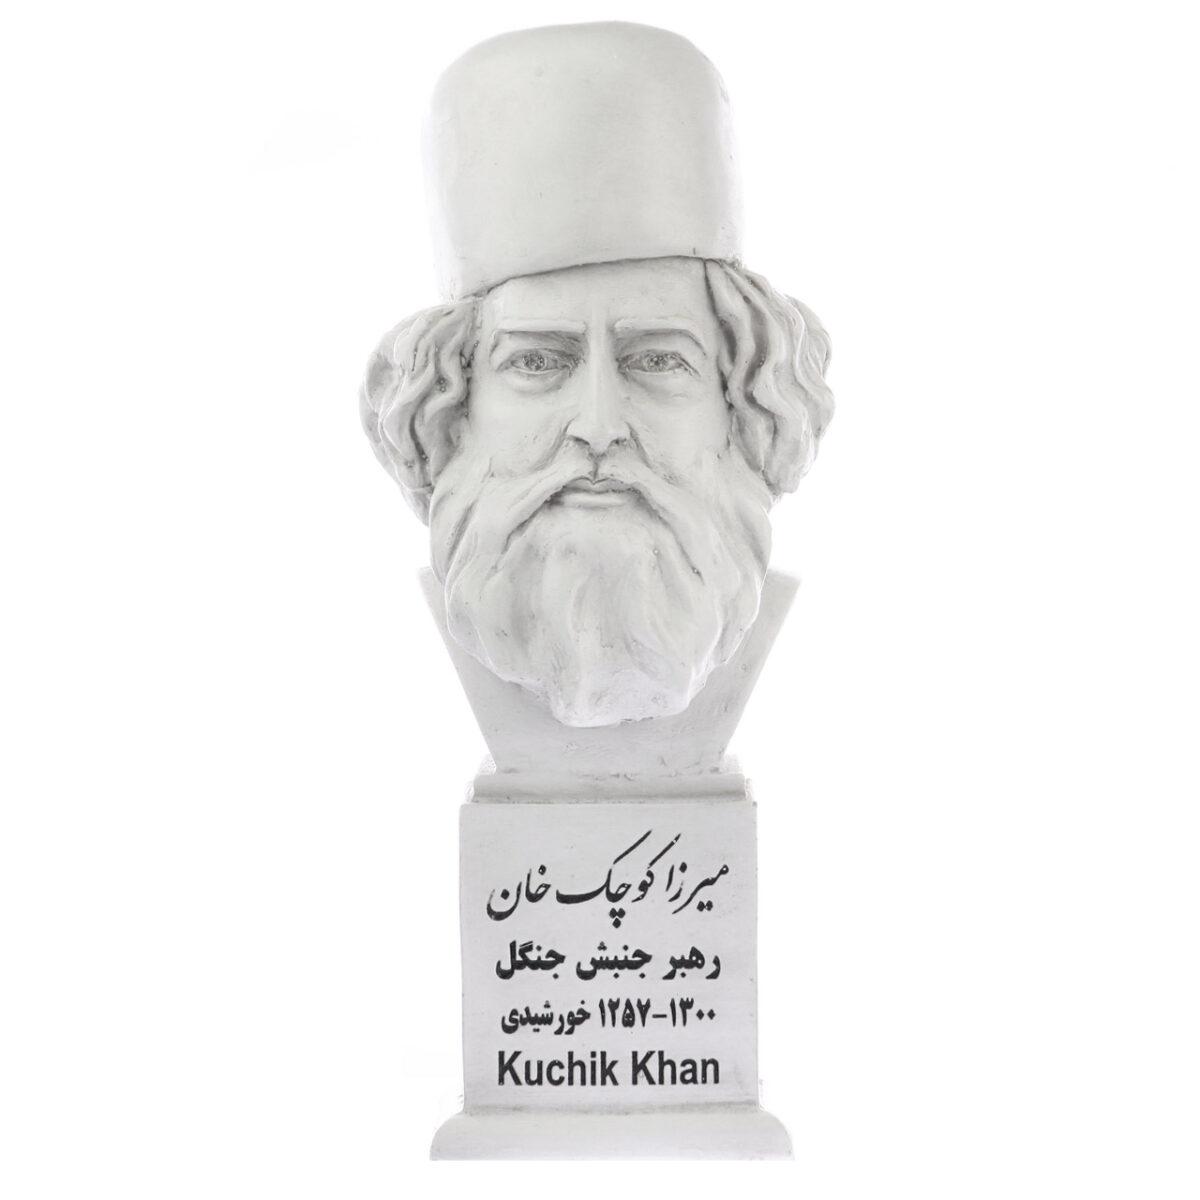 mirza kouchak khan jangali s 1200x1200 - سردیس میرزا کوچک خان جنگلی